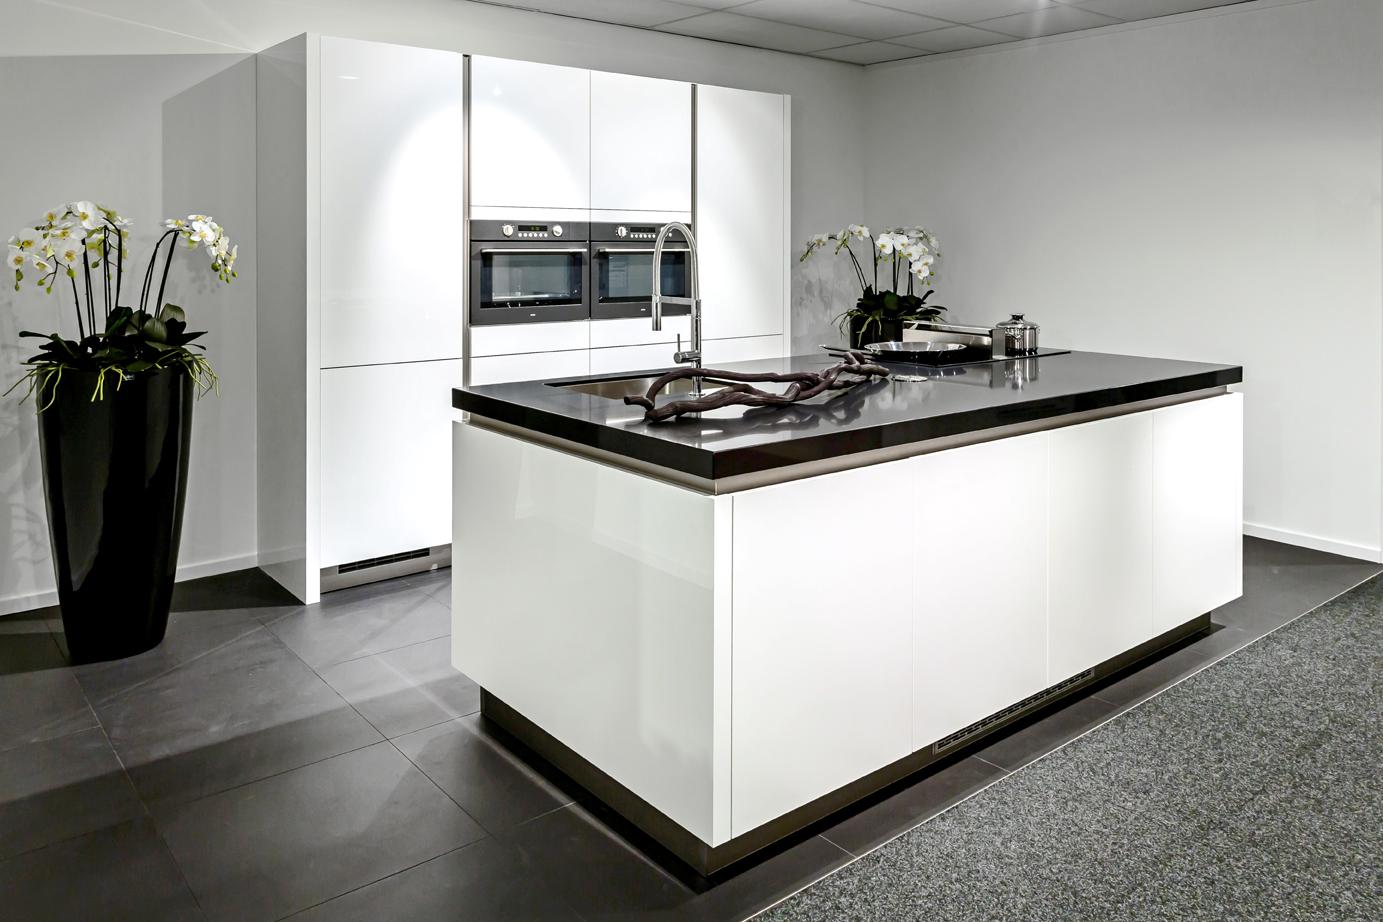 Moderne Keuken Met Eiland : Moderne keuken met eiland